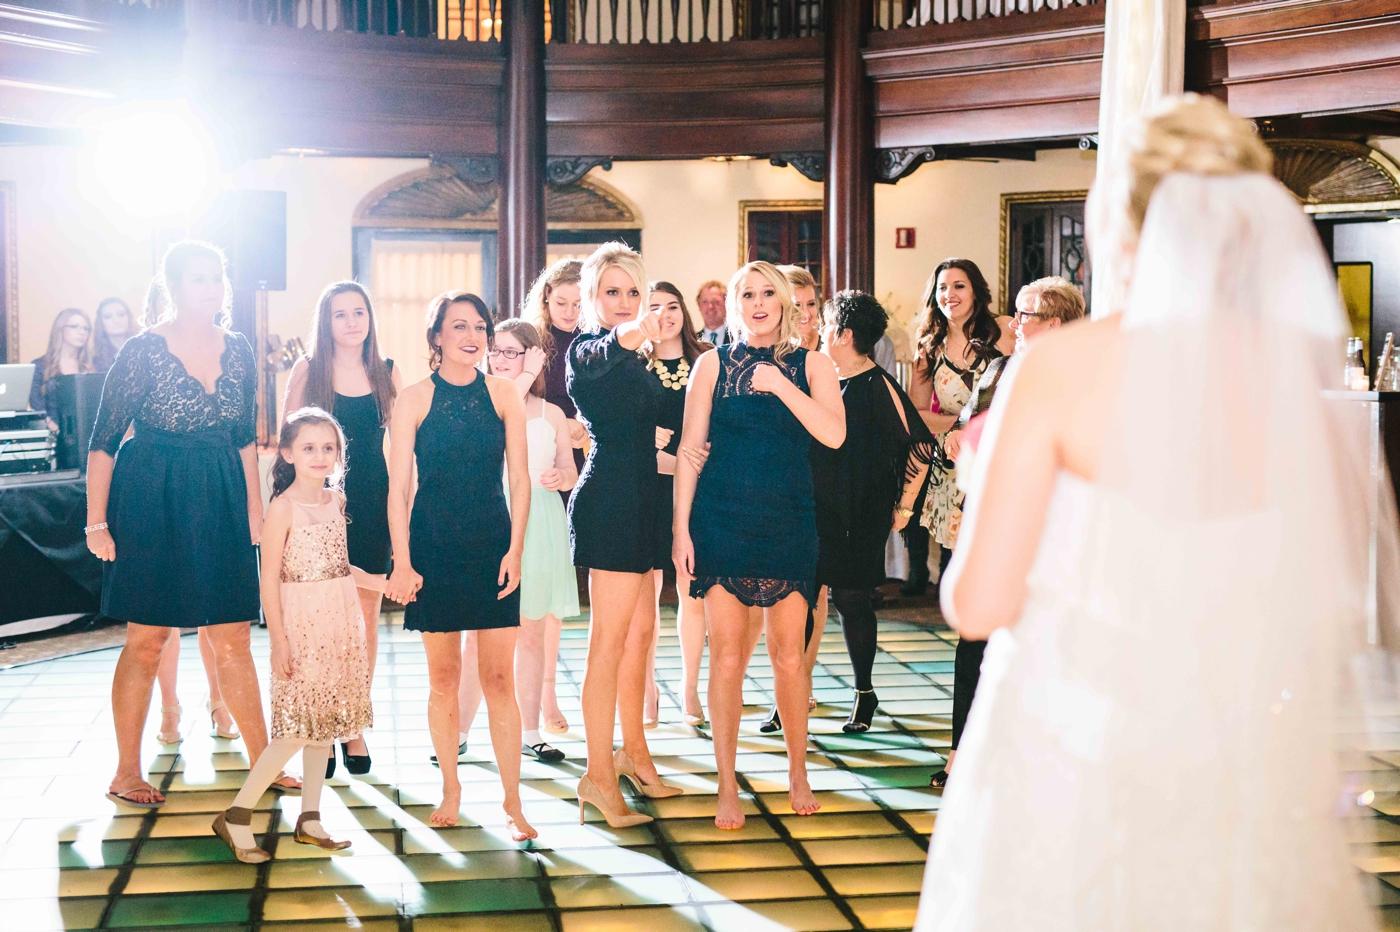 chicago-fine-art-wedding-photography-cassady24